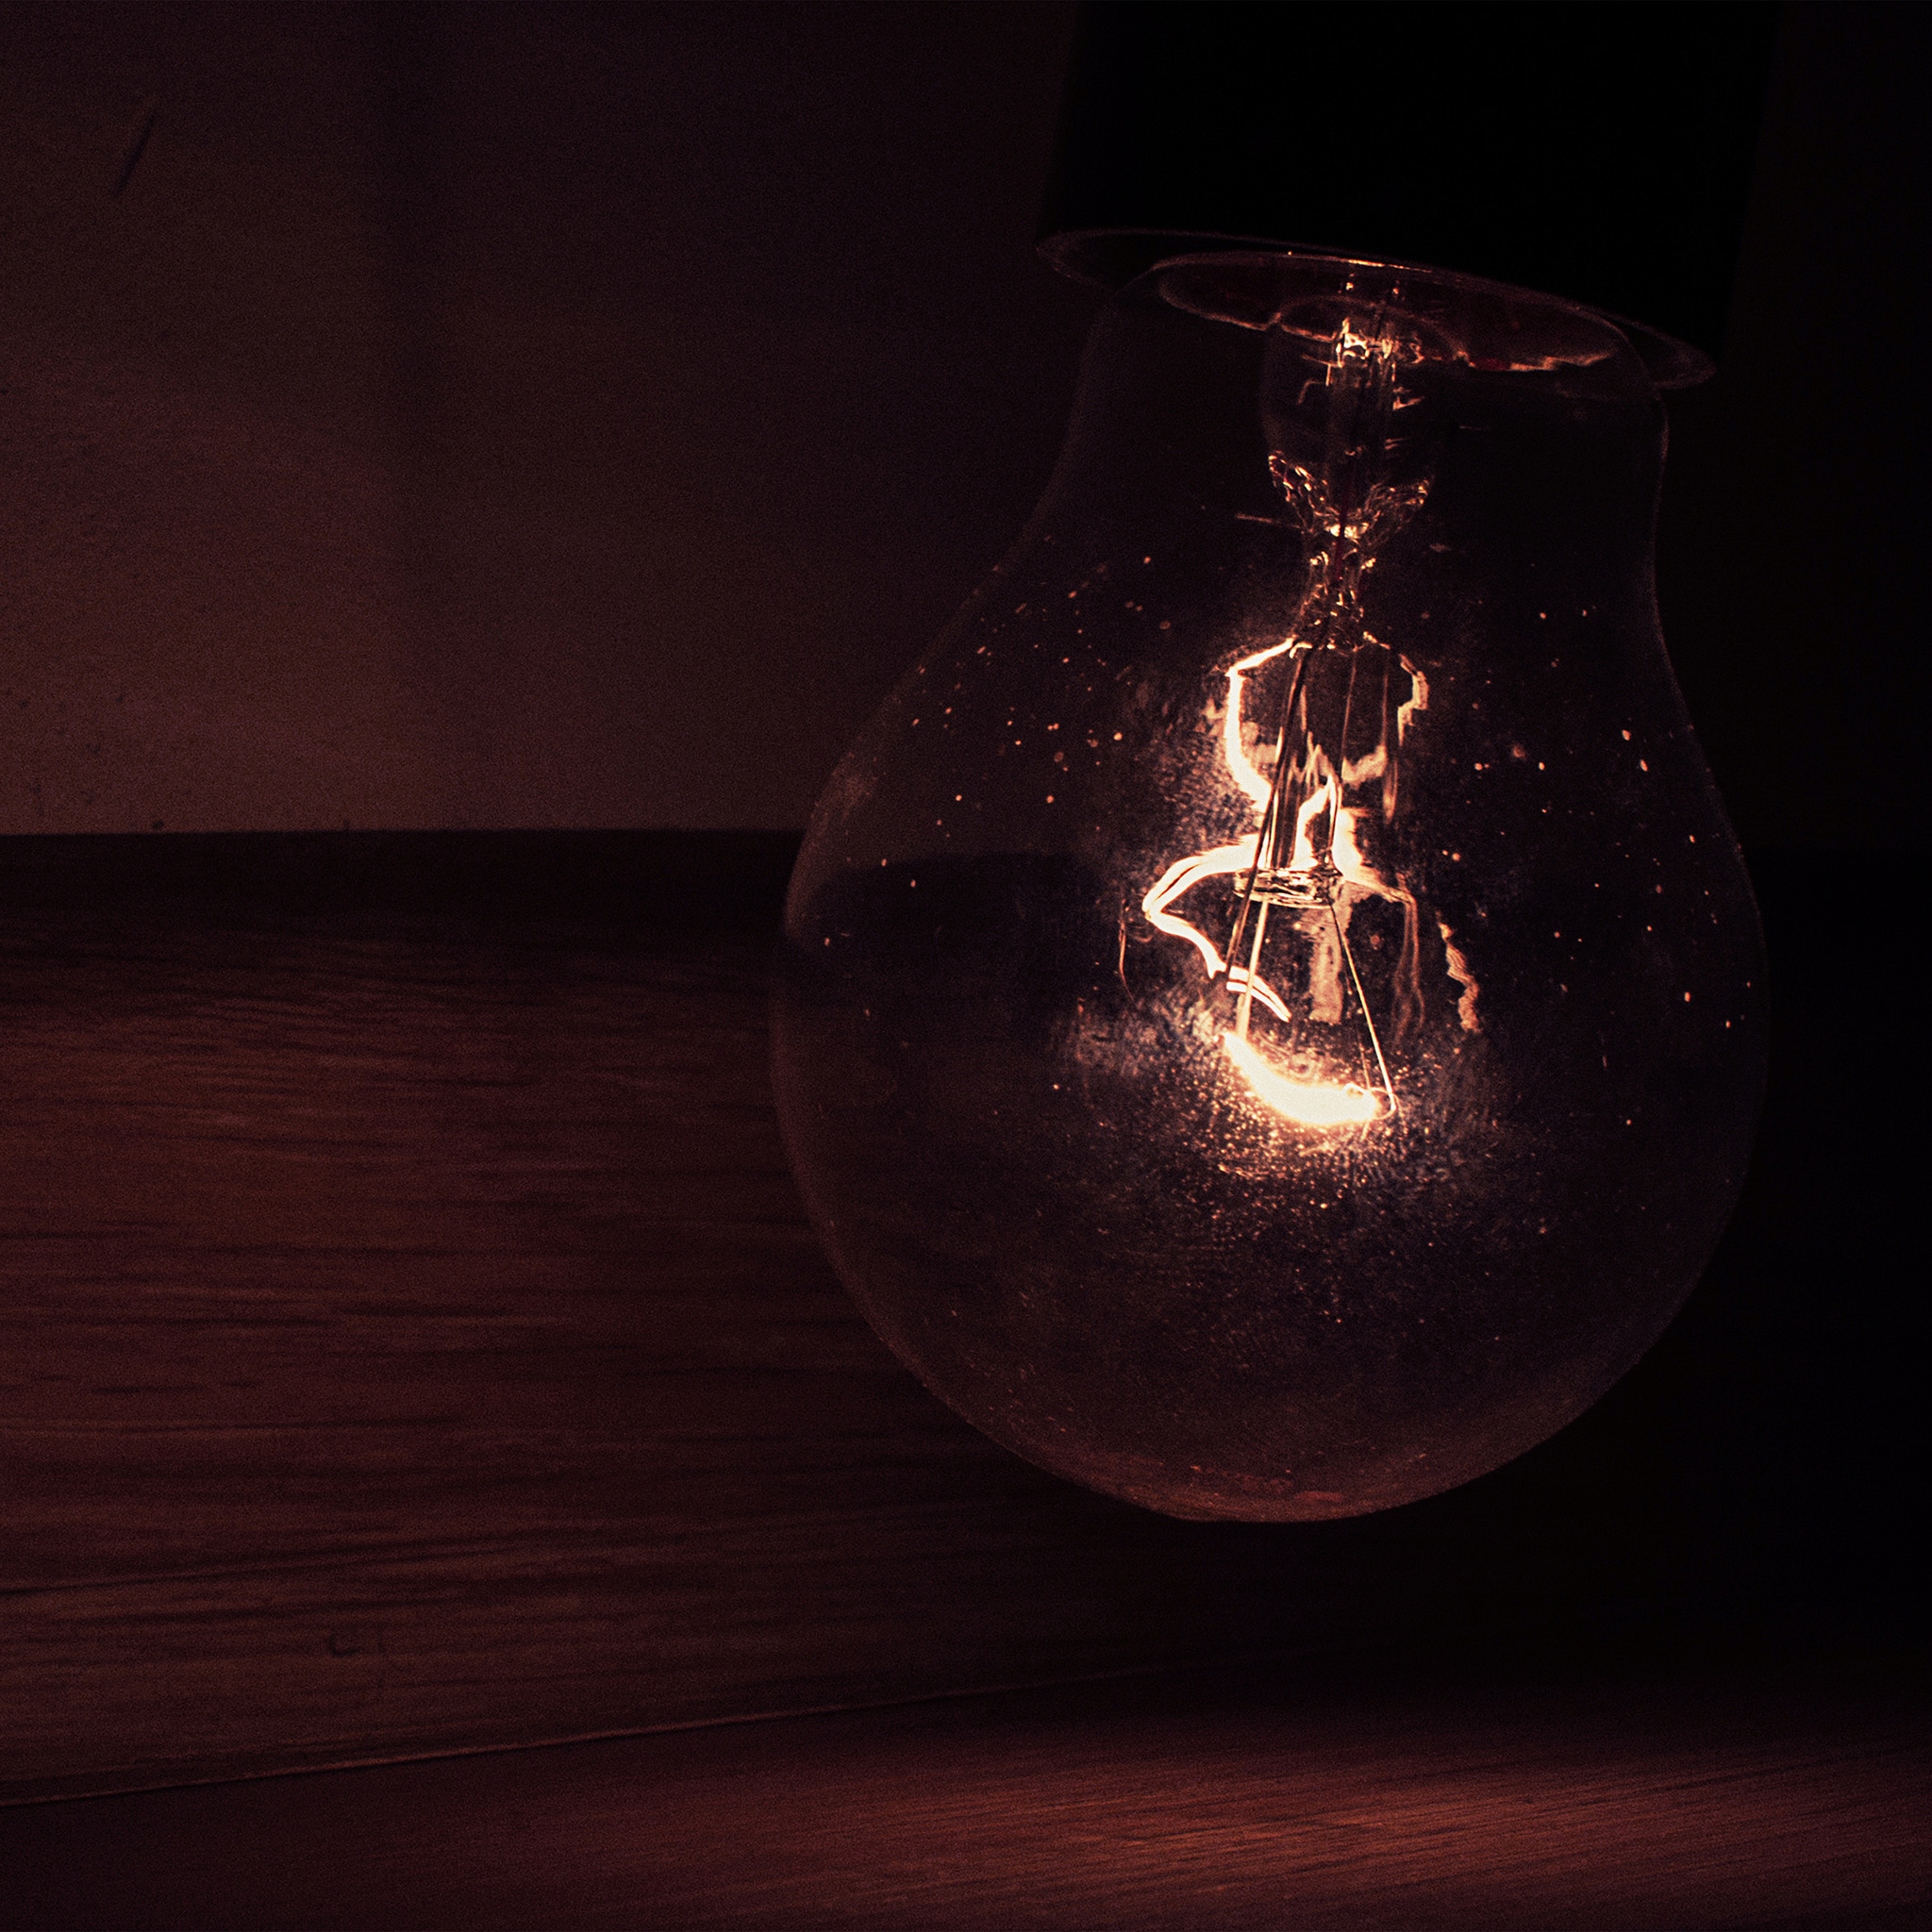 Mv94-light-night-lamp-city-silent-dark